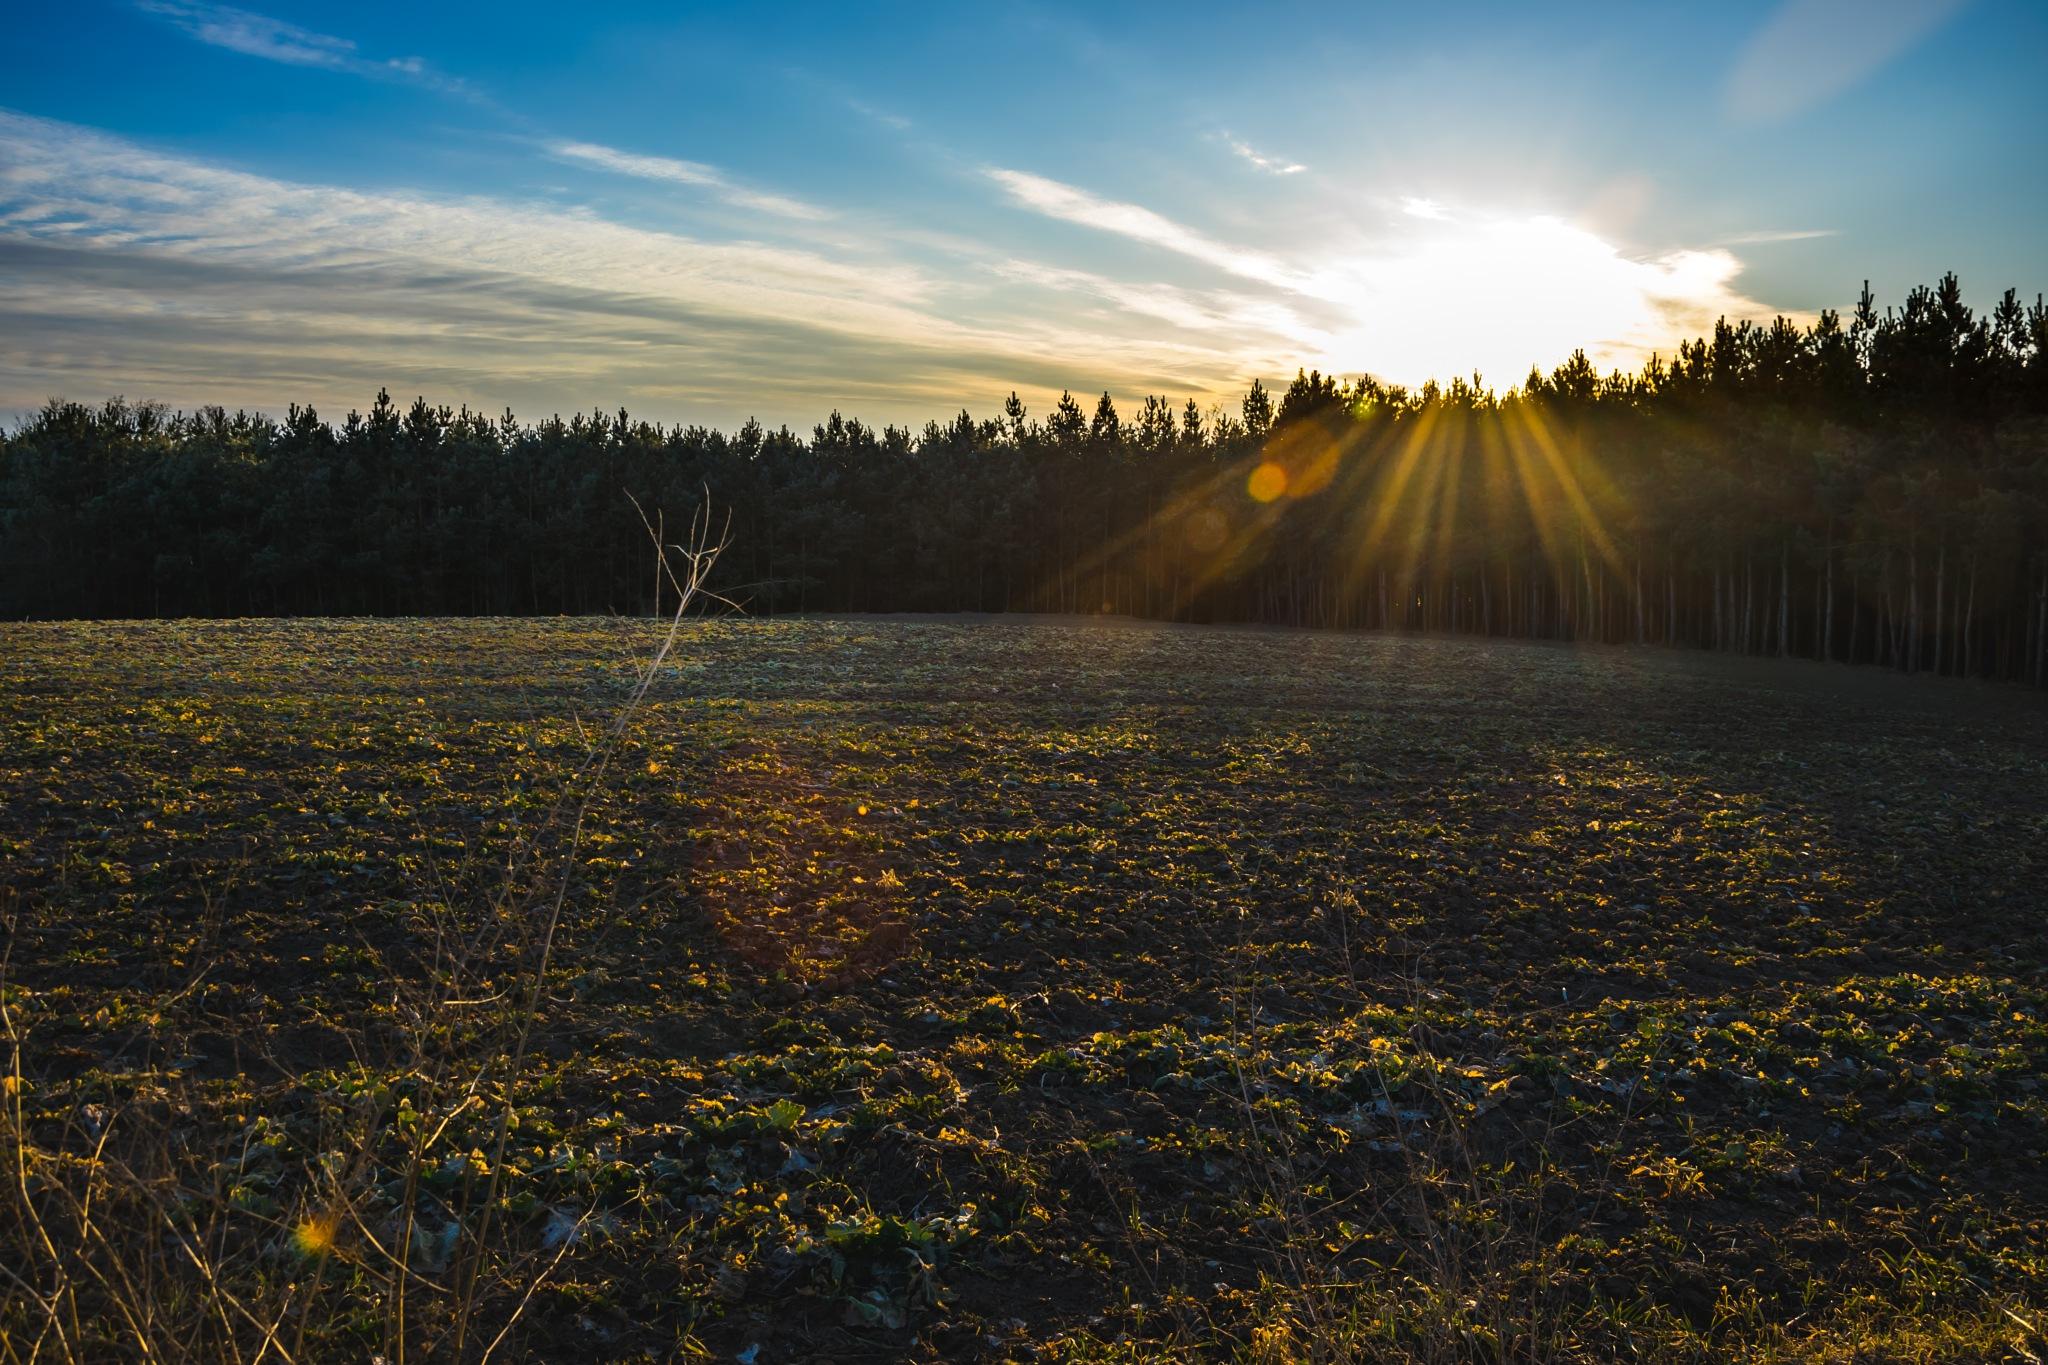 sunset by Rafał Wyzina